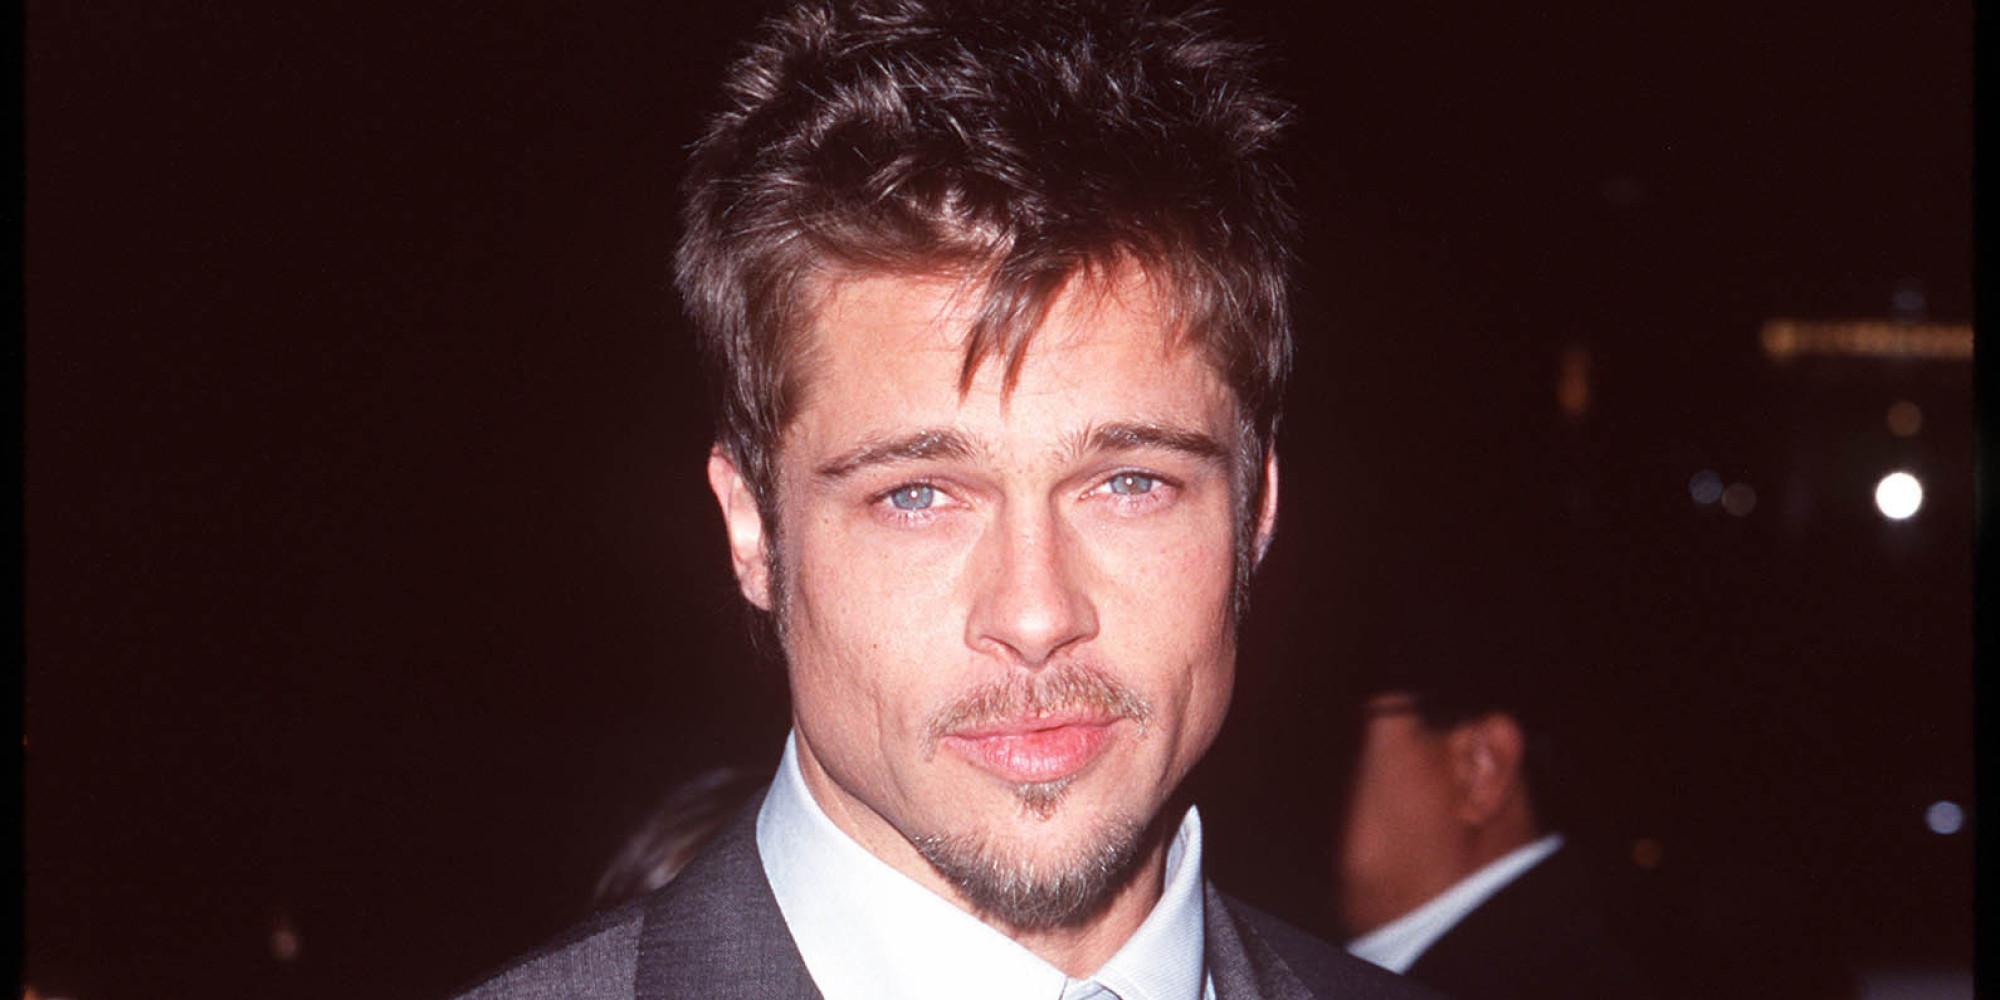 Brad Pitt's Hair Evolution Is Glorious Brad Pitt